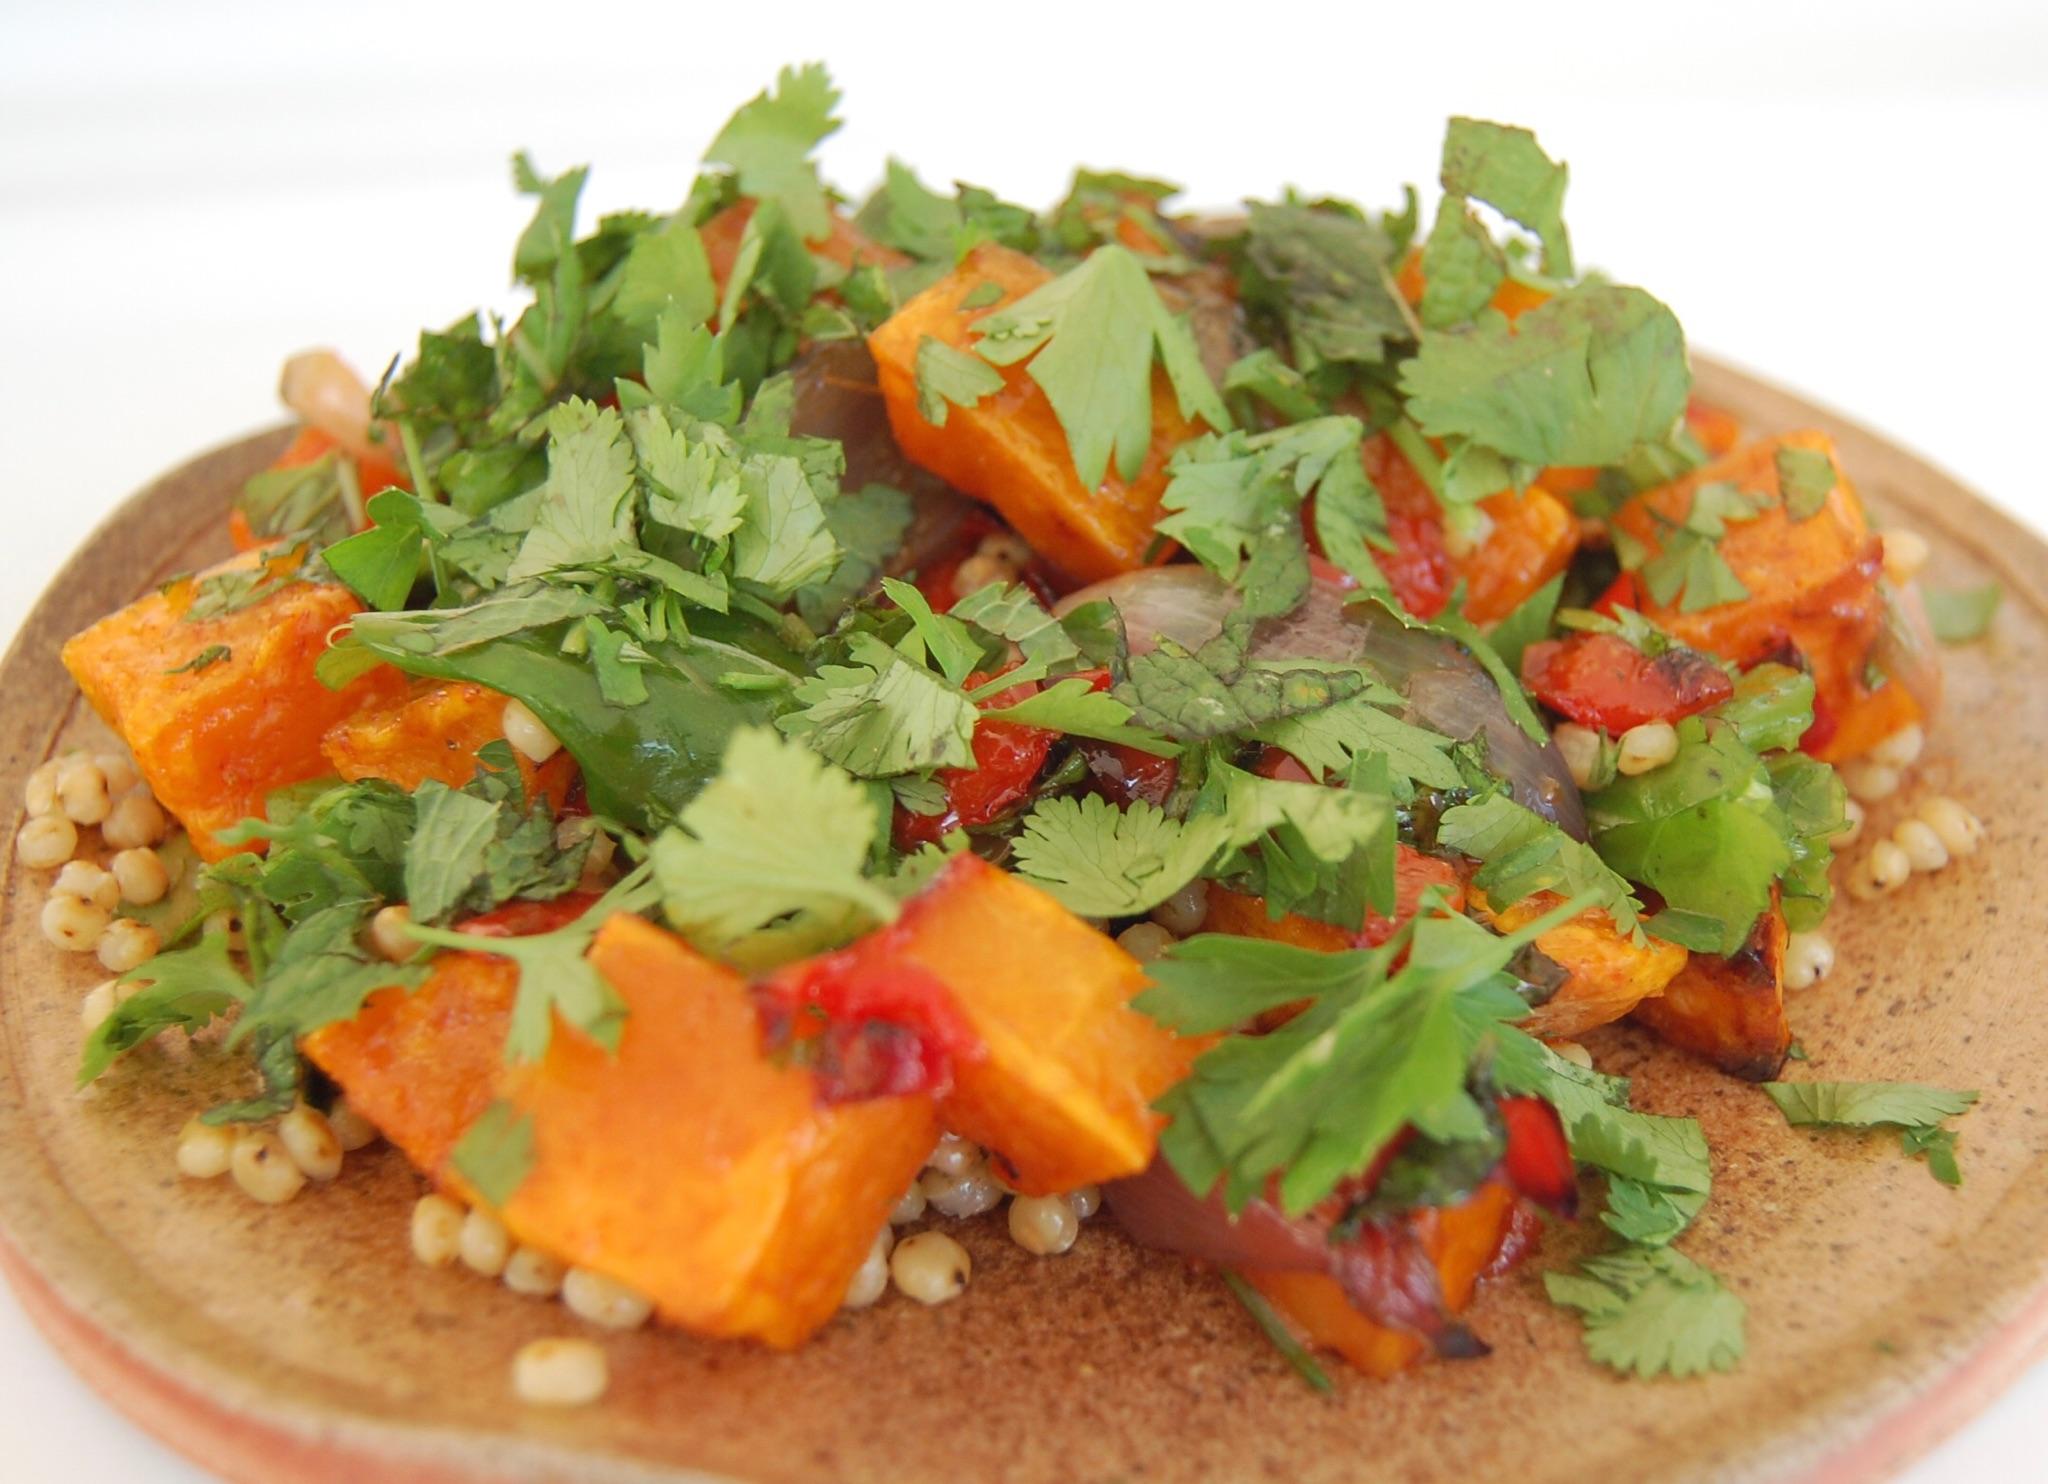 Warm Butternut Squash & Herbs Salad w Sorghum.JPG